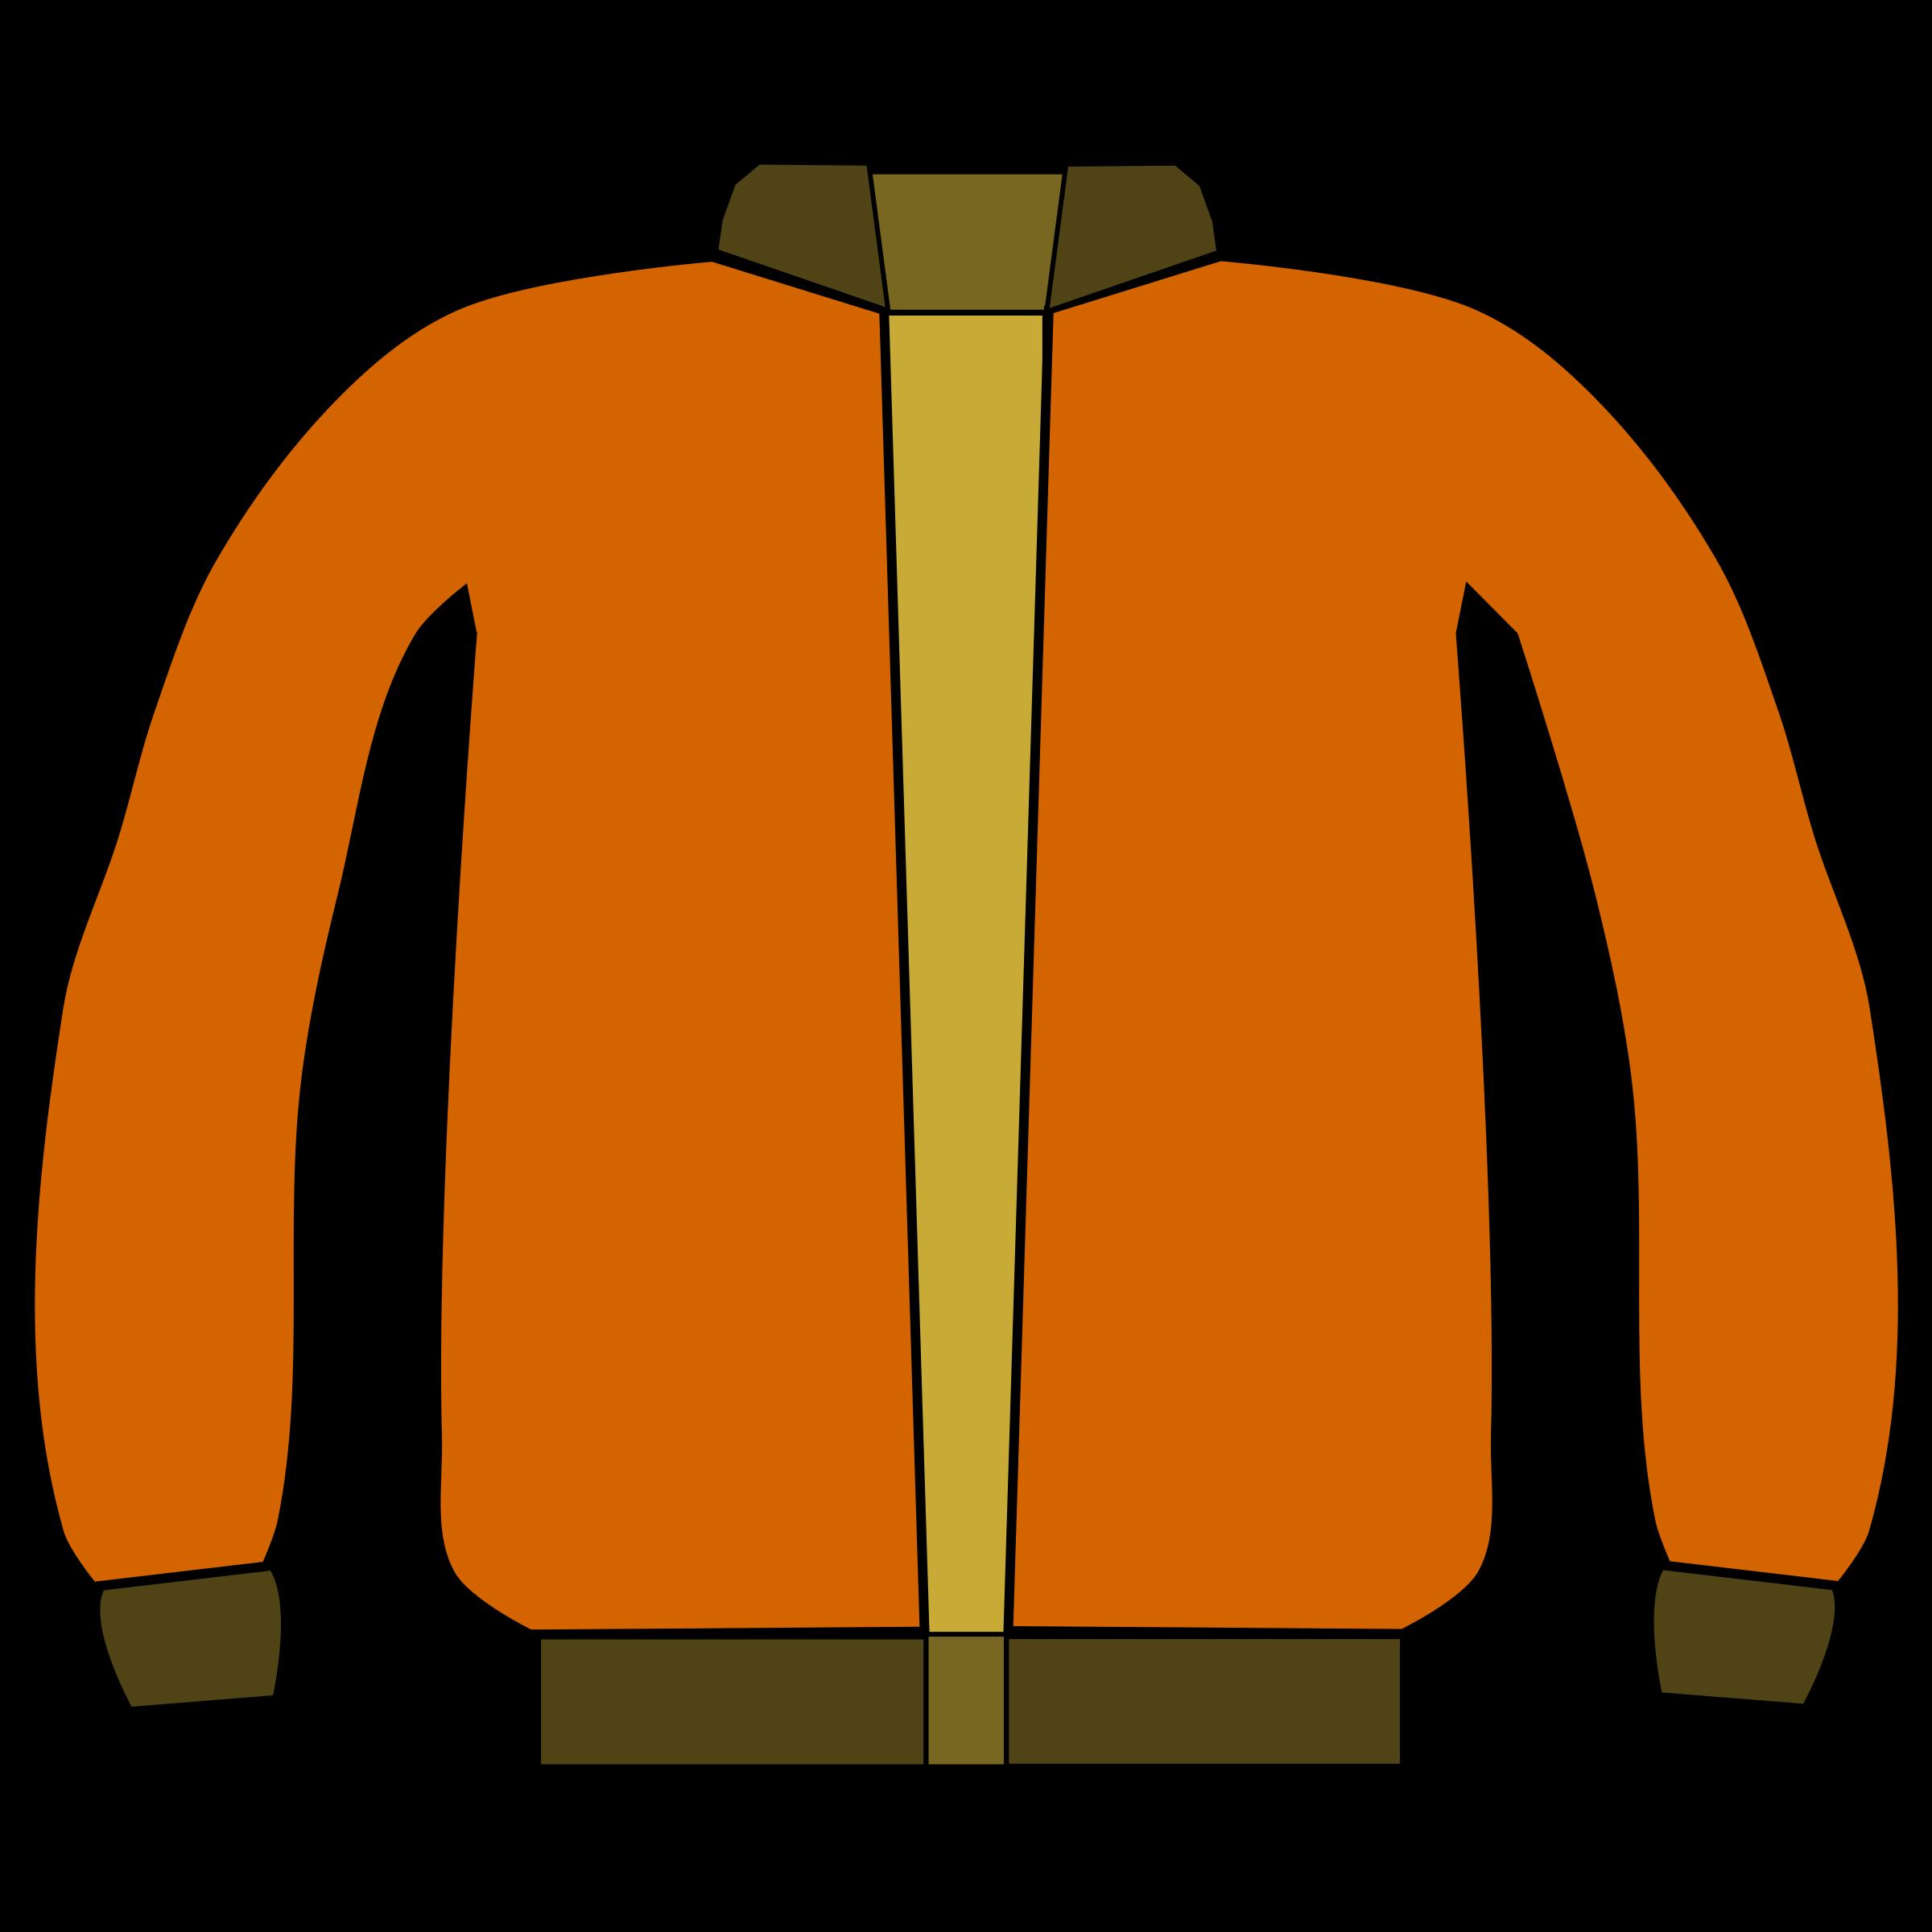 Jacket Clip Art Image  RoyaltyFree Vector Clipart Images